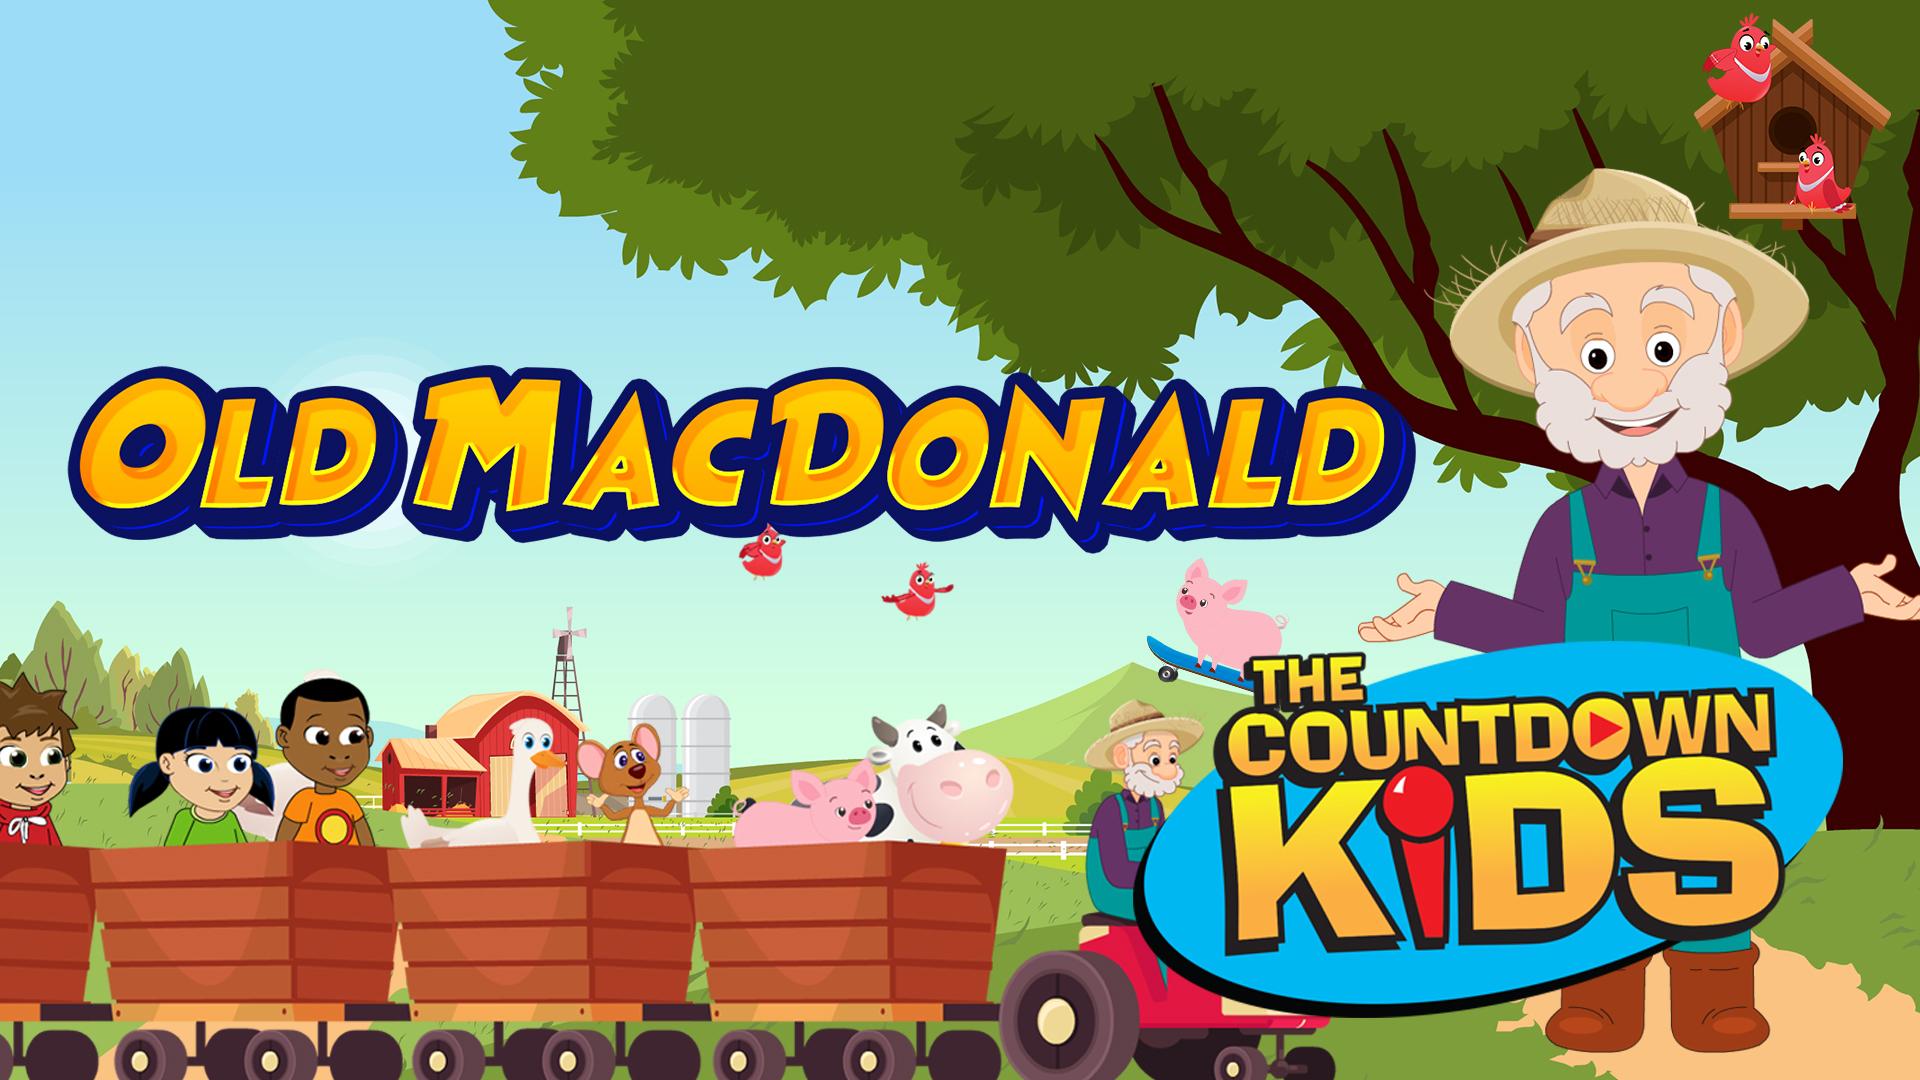 Old McDonald Had A Farm - The Countdown Kids